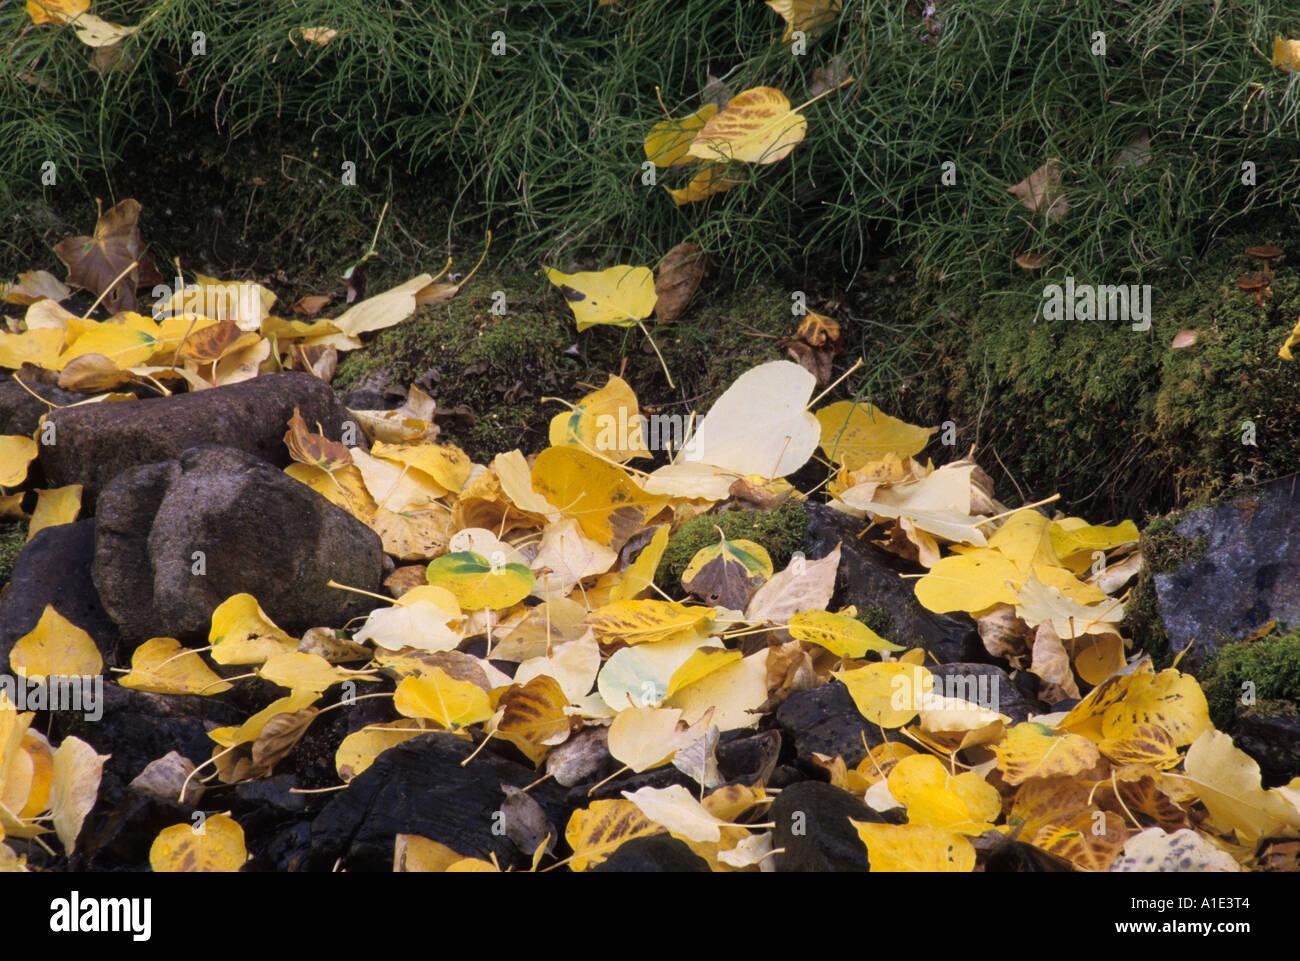 Autumn quaking aspen leaves, McGee Creek, Eastern Sierra, California Stock Photo